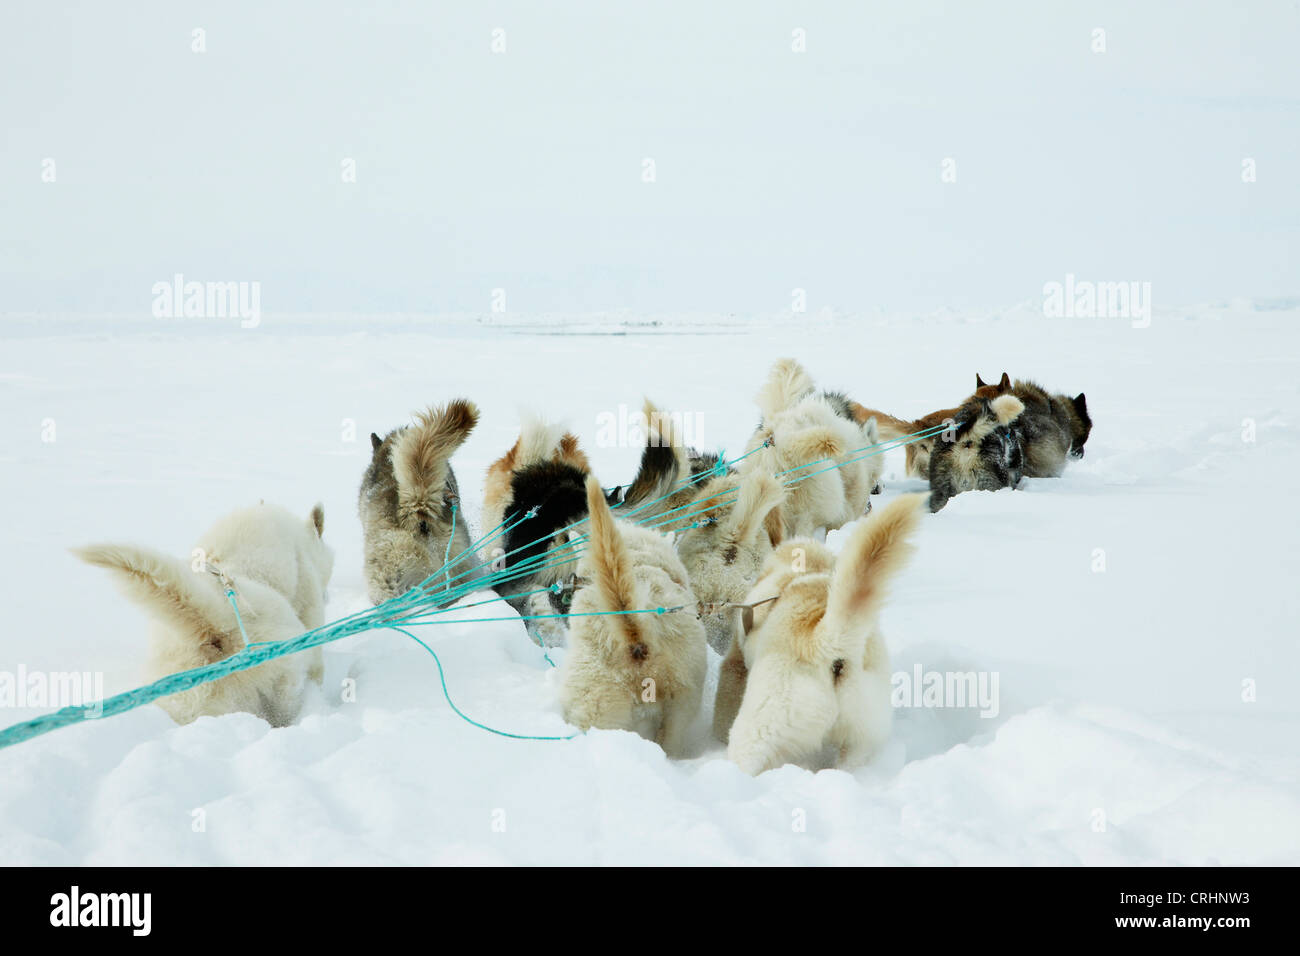 Greenland Dog (Canis lupus f. familiaris), sledge dogs pulling the sledge, Greenland, Ostgroenland, Tunu, Kalaallit - Stock Image